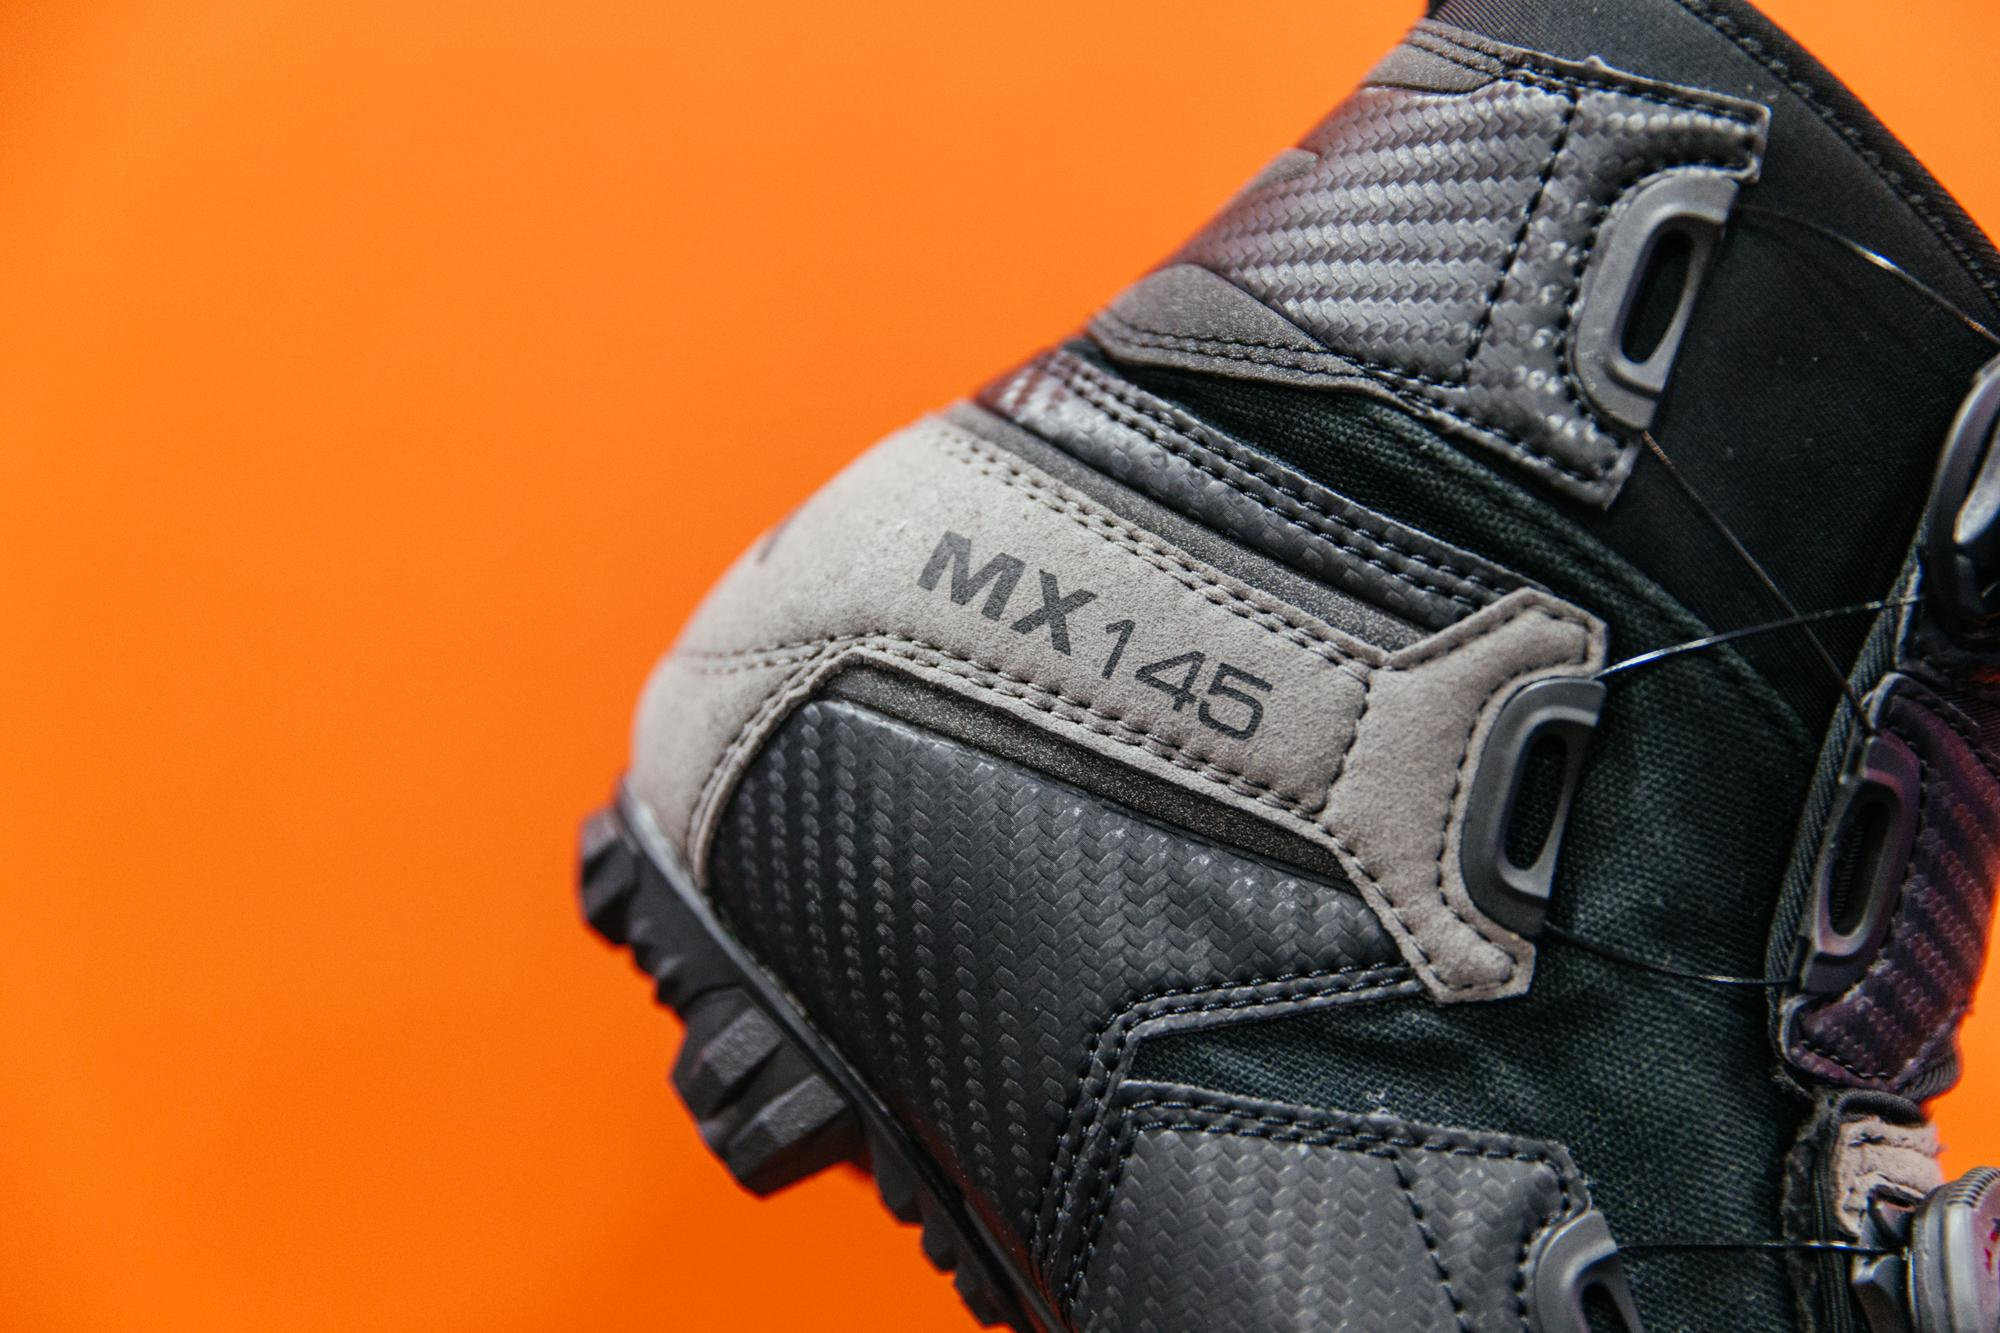 Lake's MX145